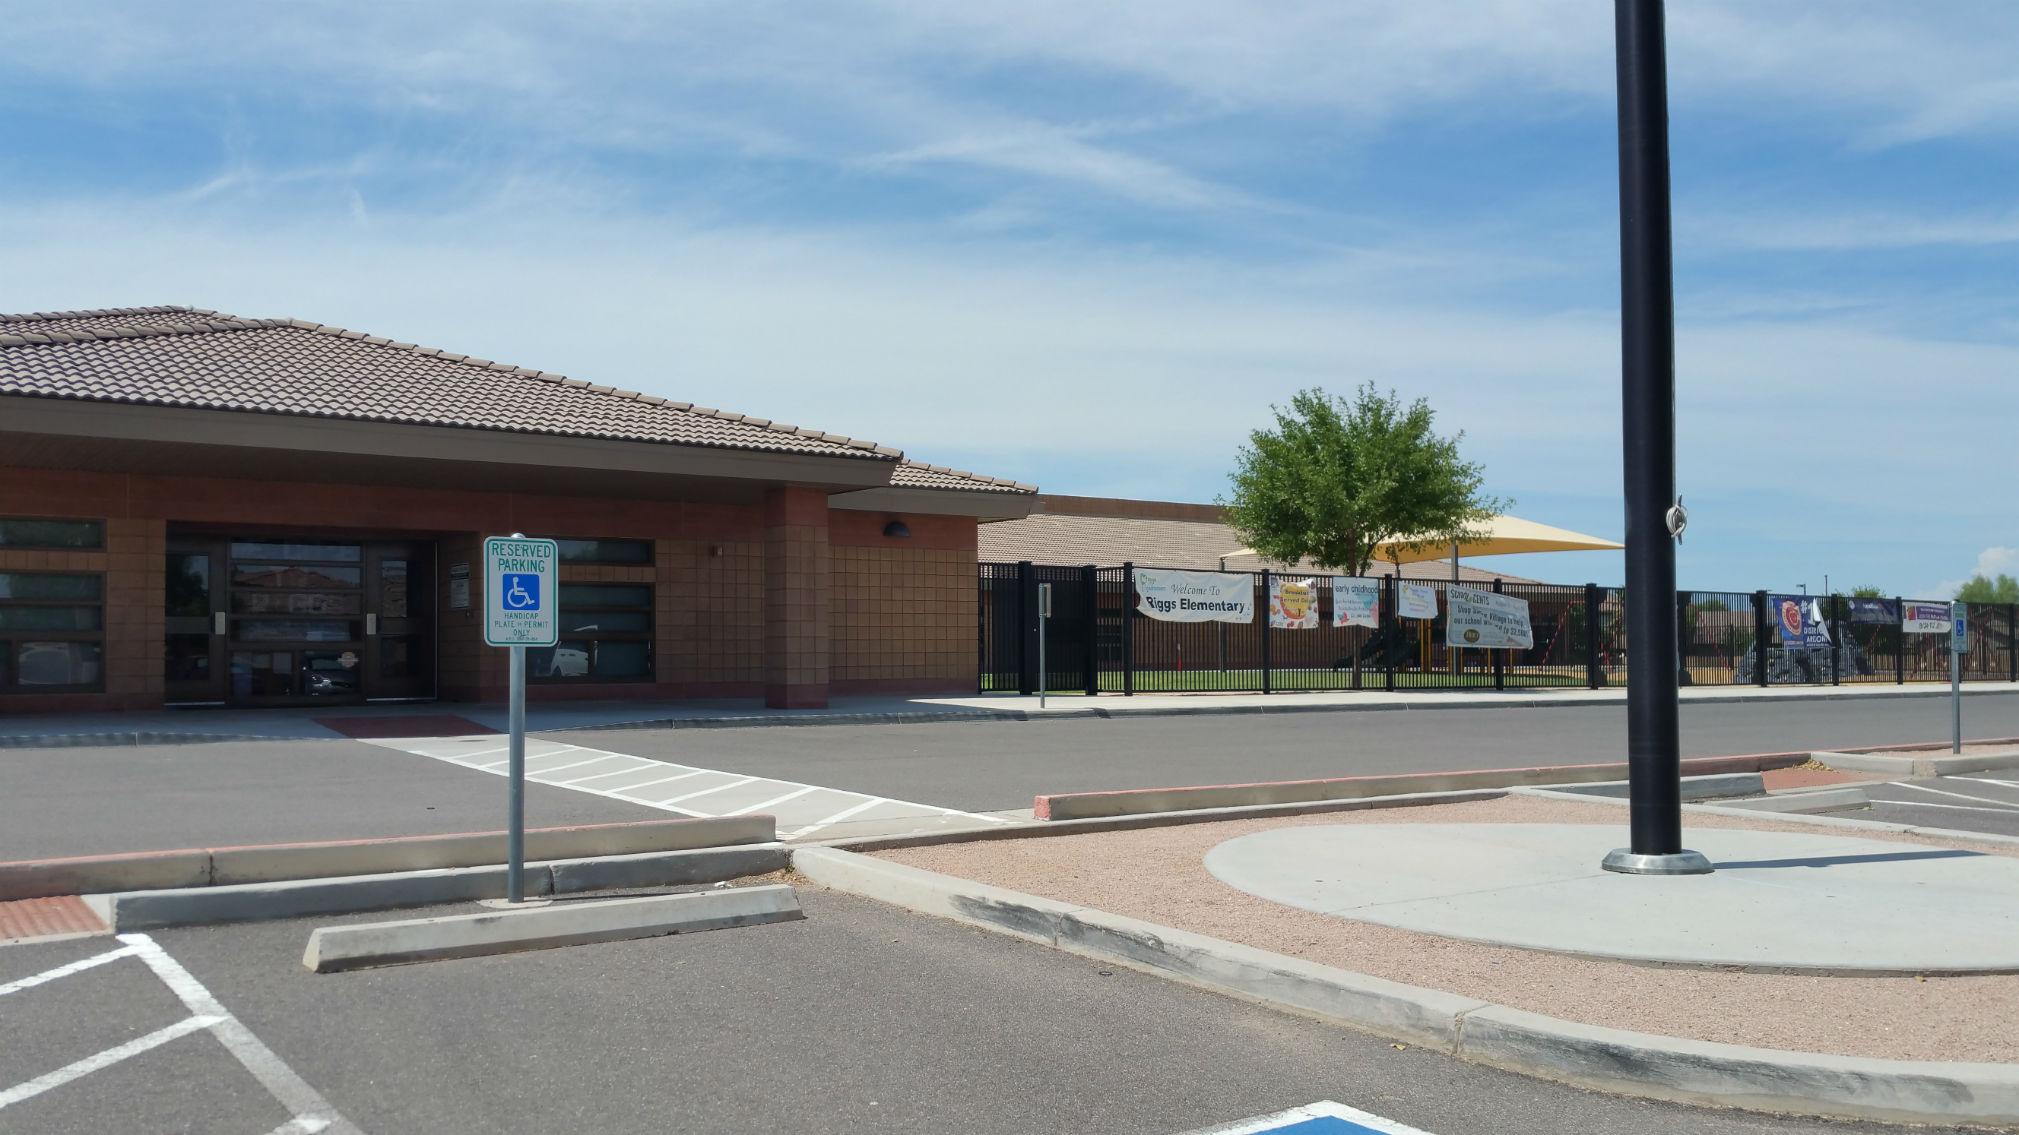 Riggs Elementary